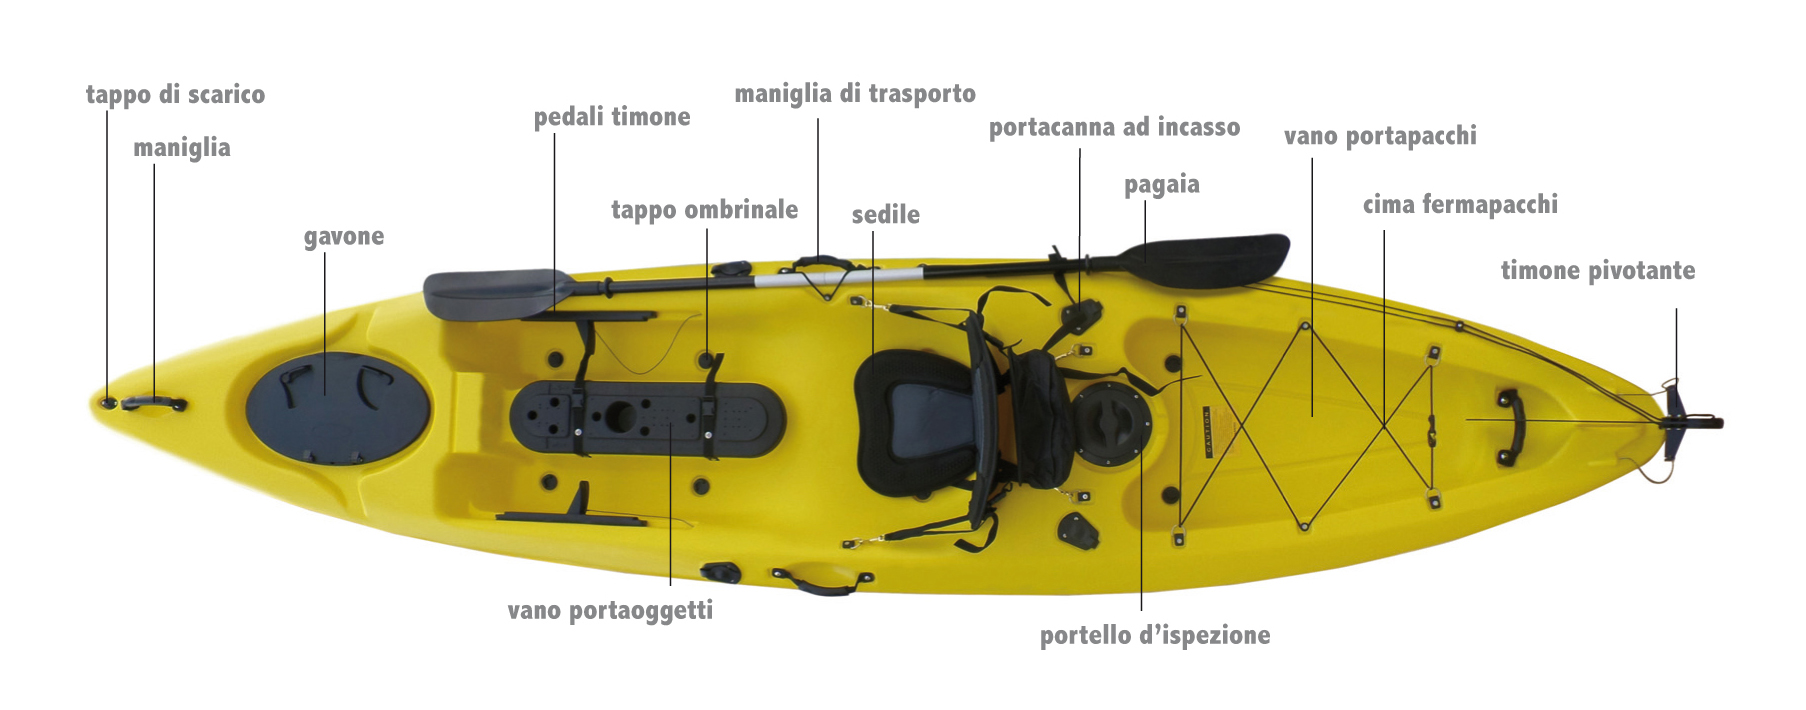 Kayak Division Barka Accessori Nautici